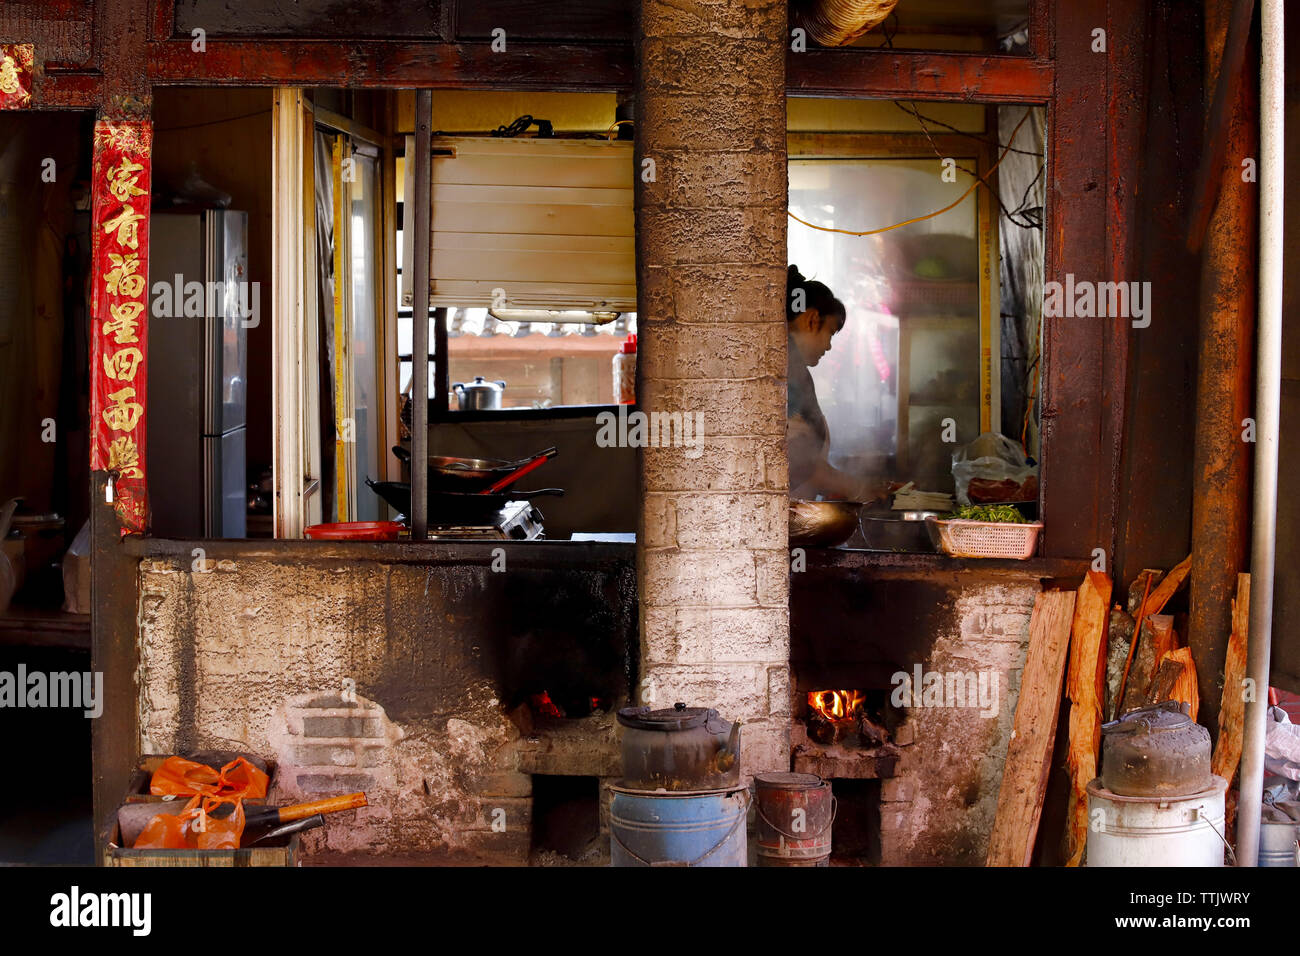 Chinese Food Lijiang Yunnan China Stockfotos und -bilder Kaufen